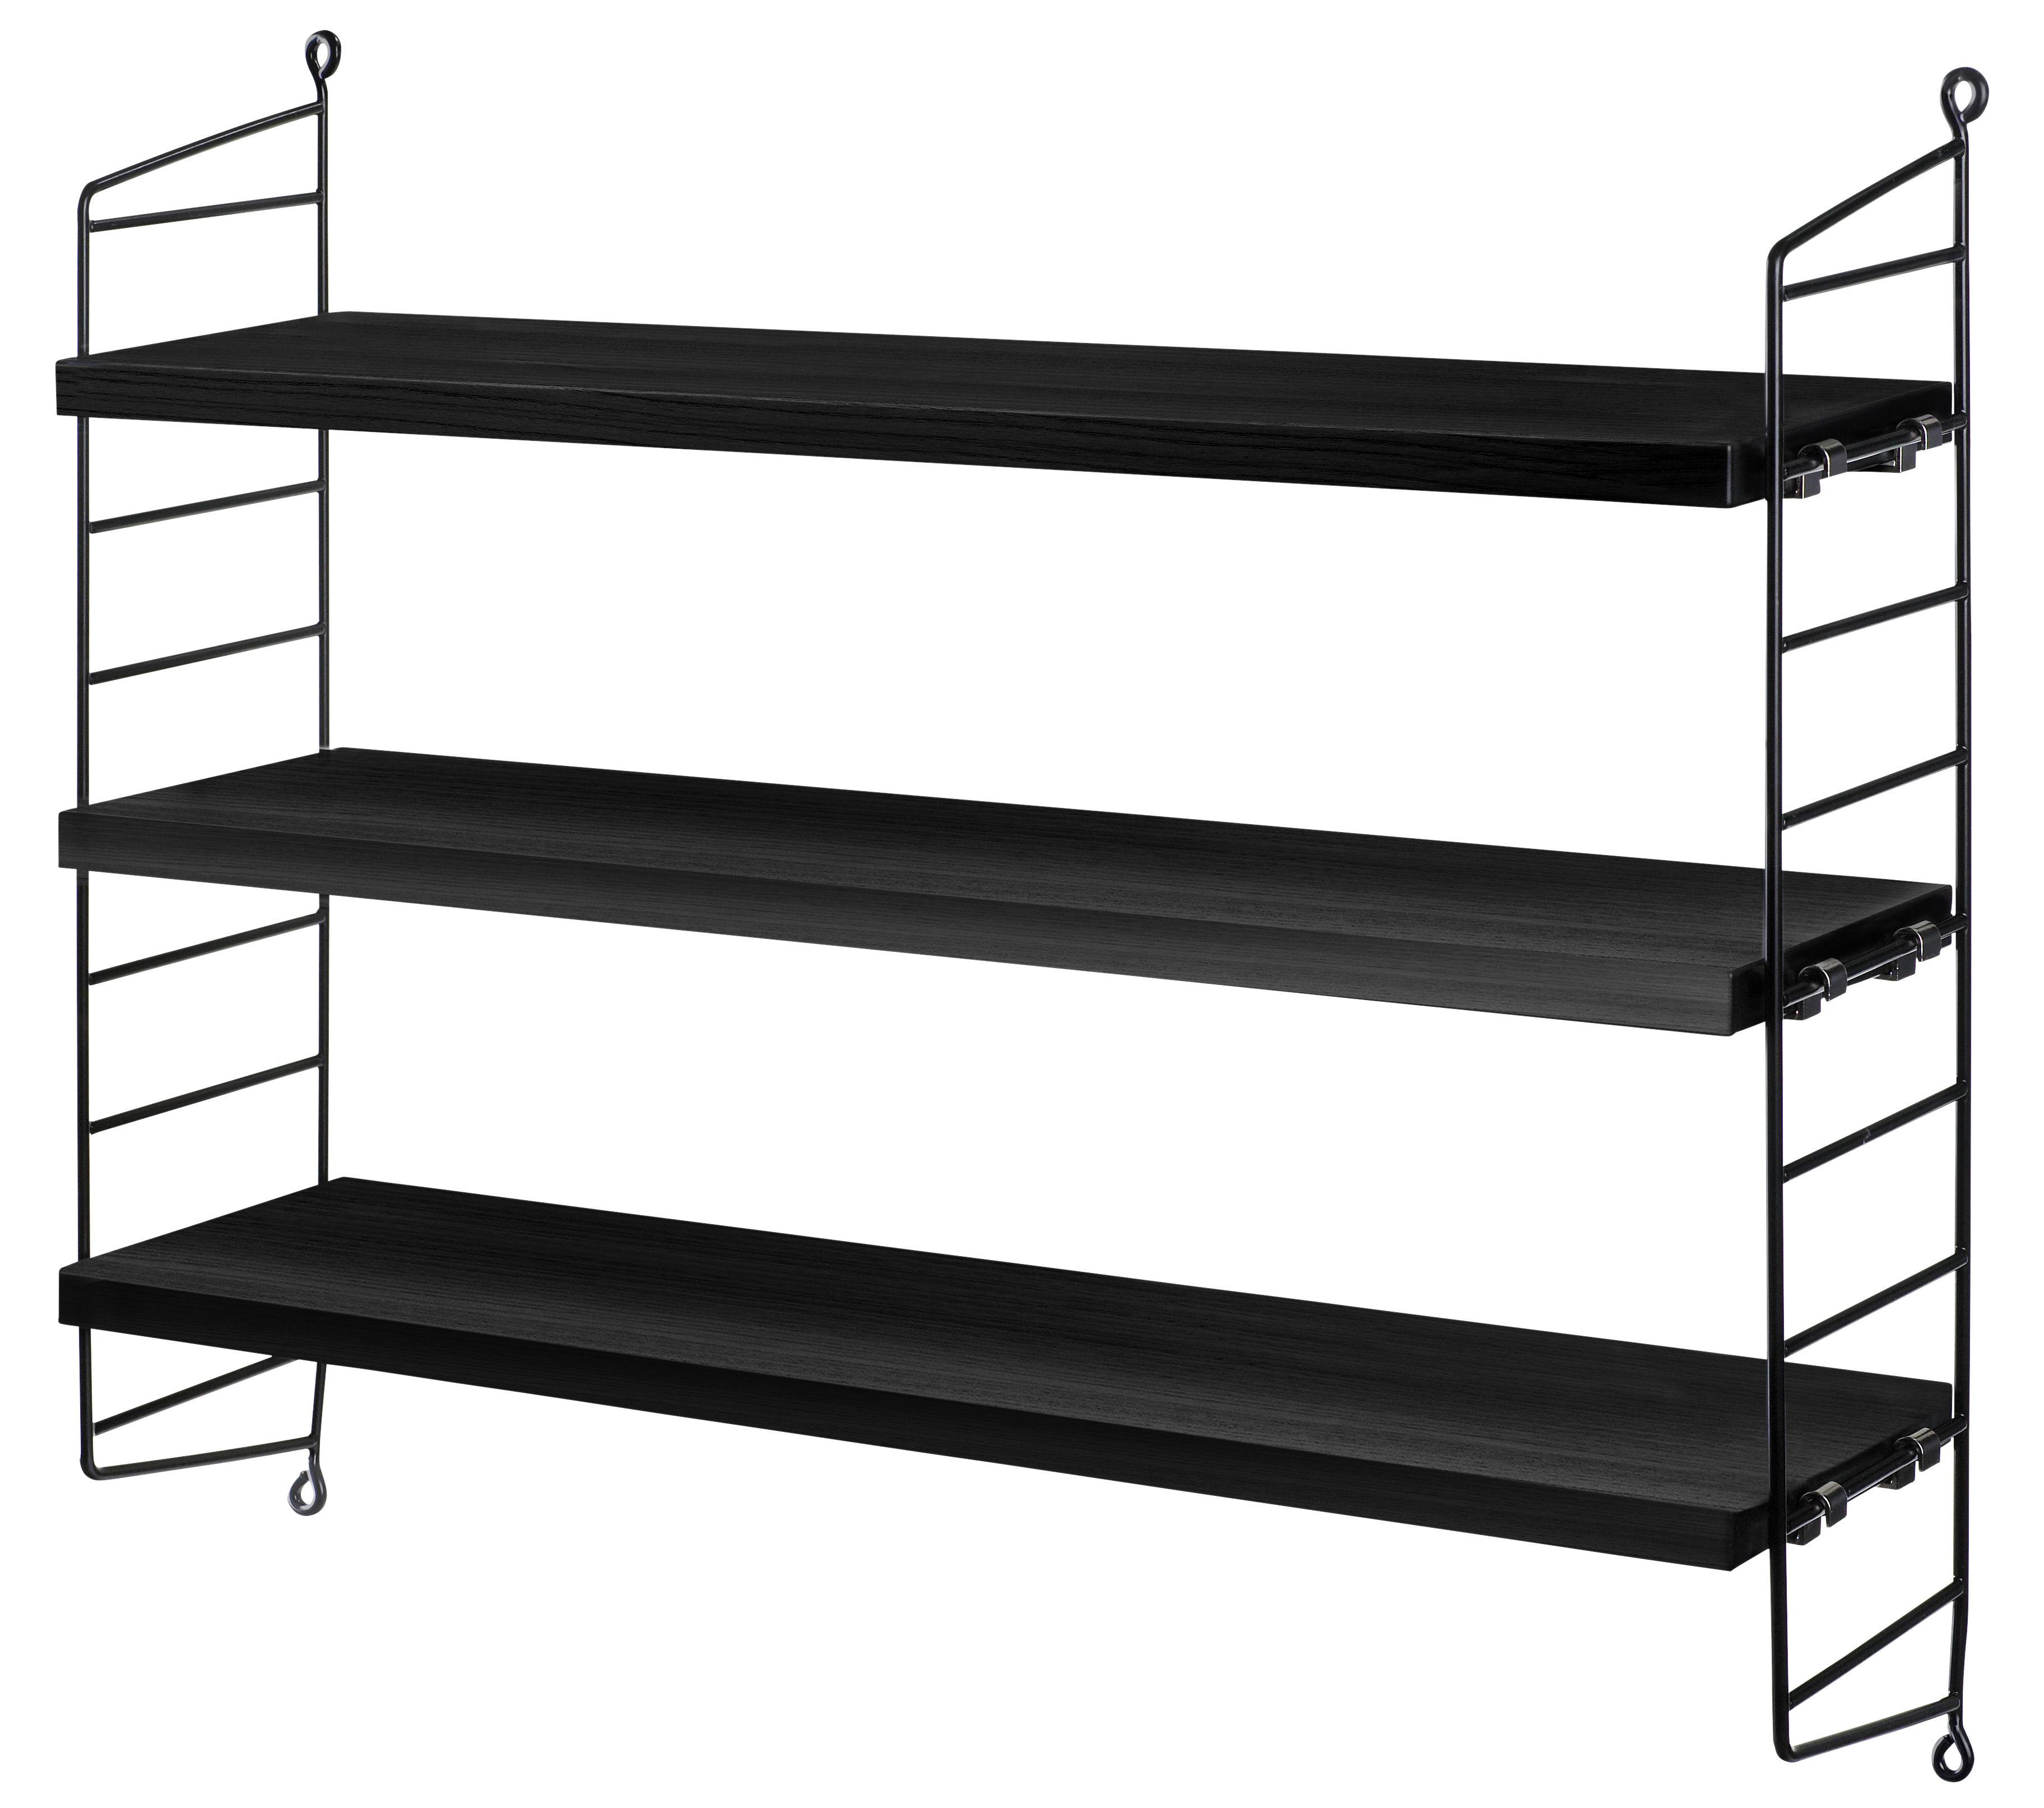 etag re string pocket version bois l 60 x h 50 cm fr ne teint noir montants noirs string. Black Bedroom Furniture Sets. Home Design Ideas